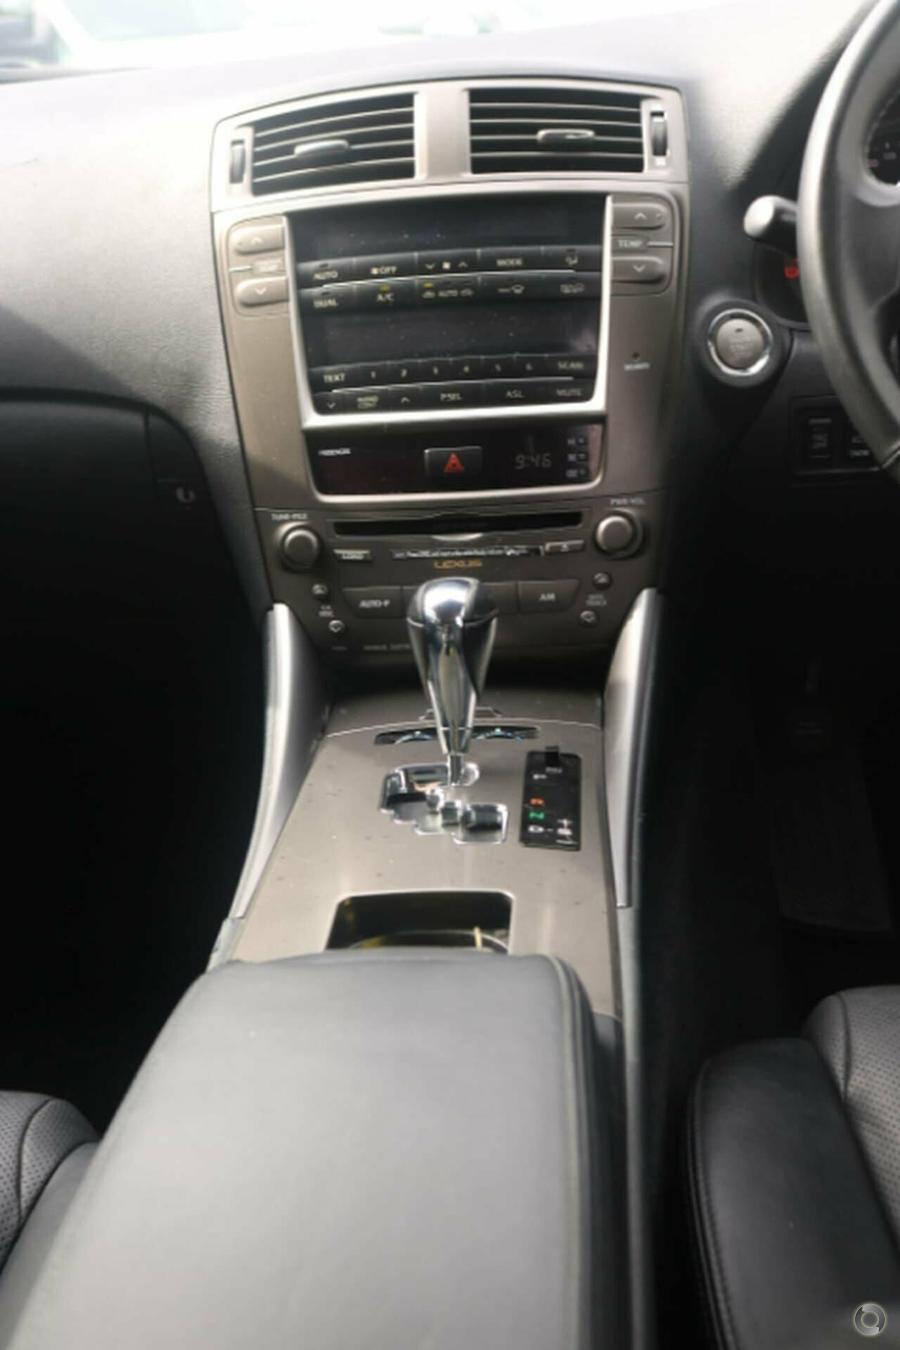 2006 Lexus Is250 Prestige GSE20R - Wakeling Automotive